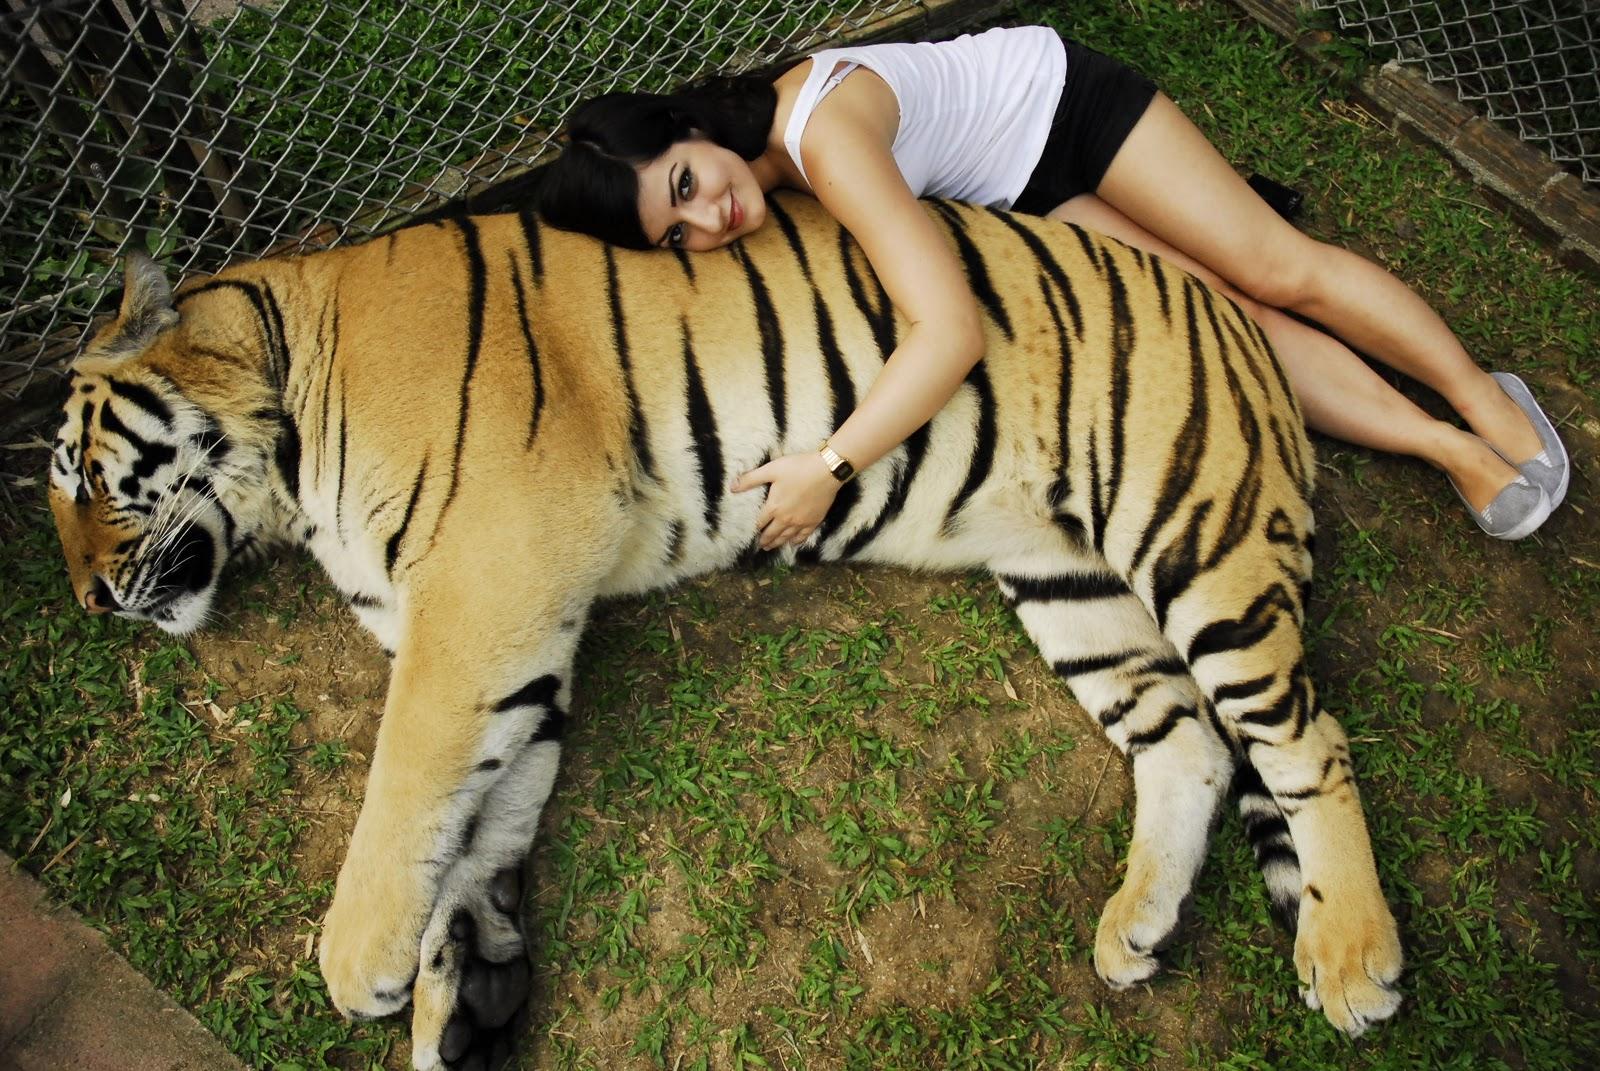 Matts Travel Blog: Tiger Kingdom, Chiang Mai